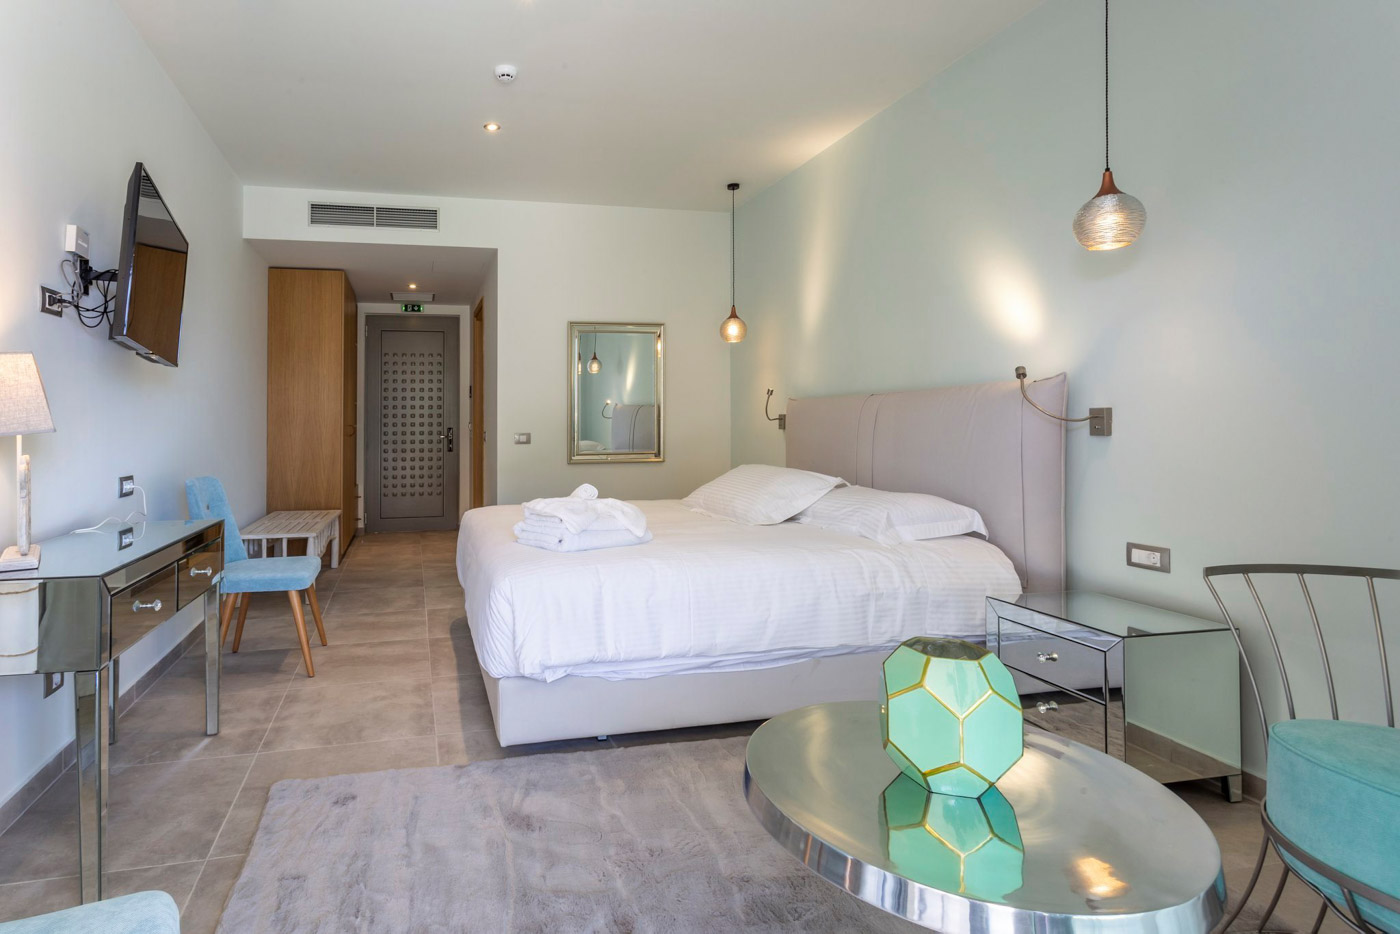 Elysian luxury hotel and spa Kalamata Junior suite bedroom